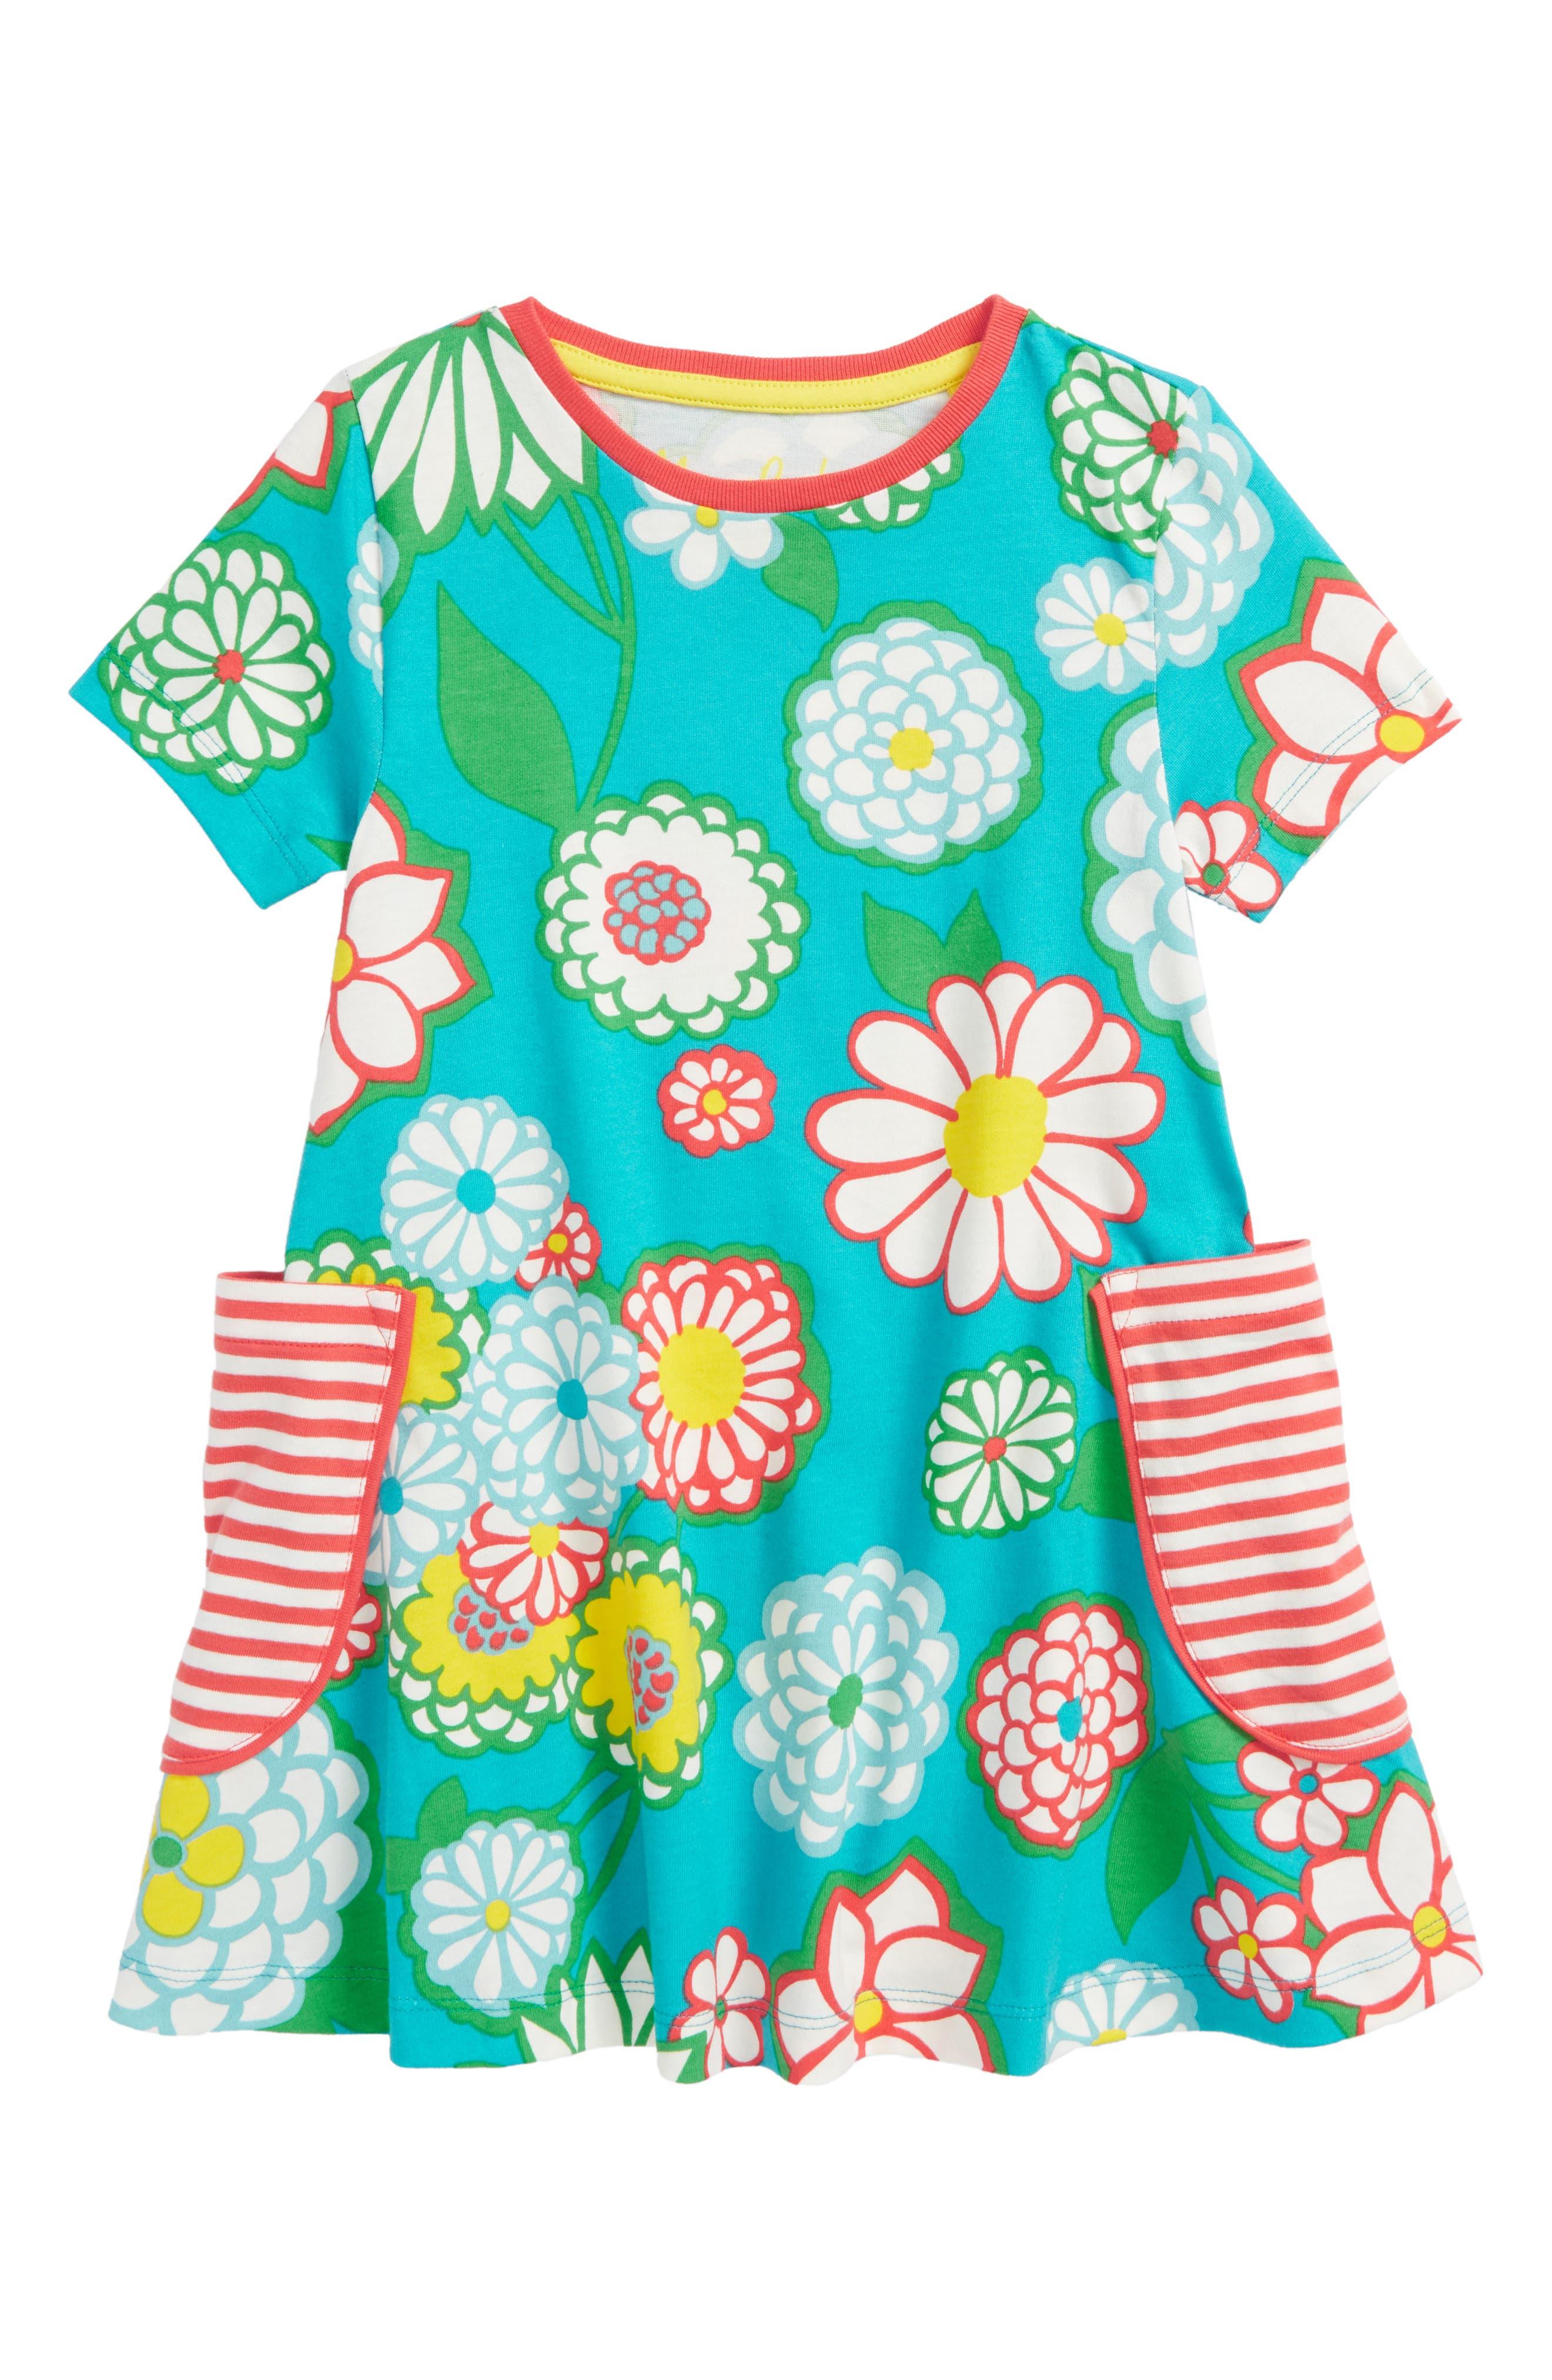 Colorful Print Tunic,                             Main thumbnail 1, color,                             Ultramarine Green Daisy Grn